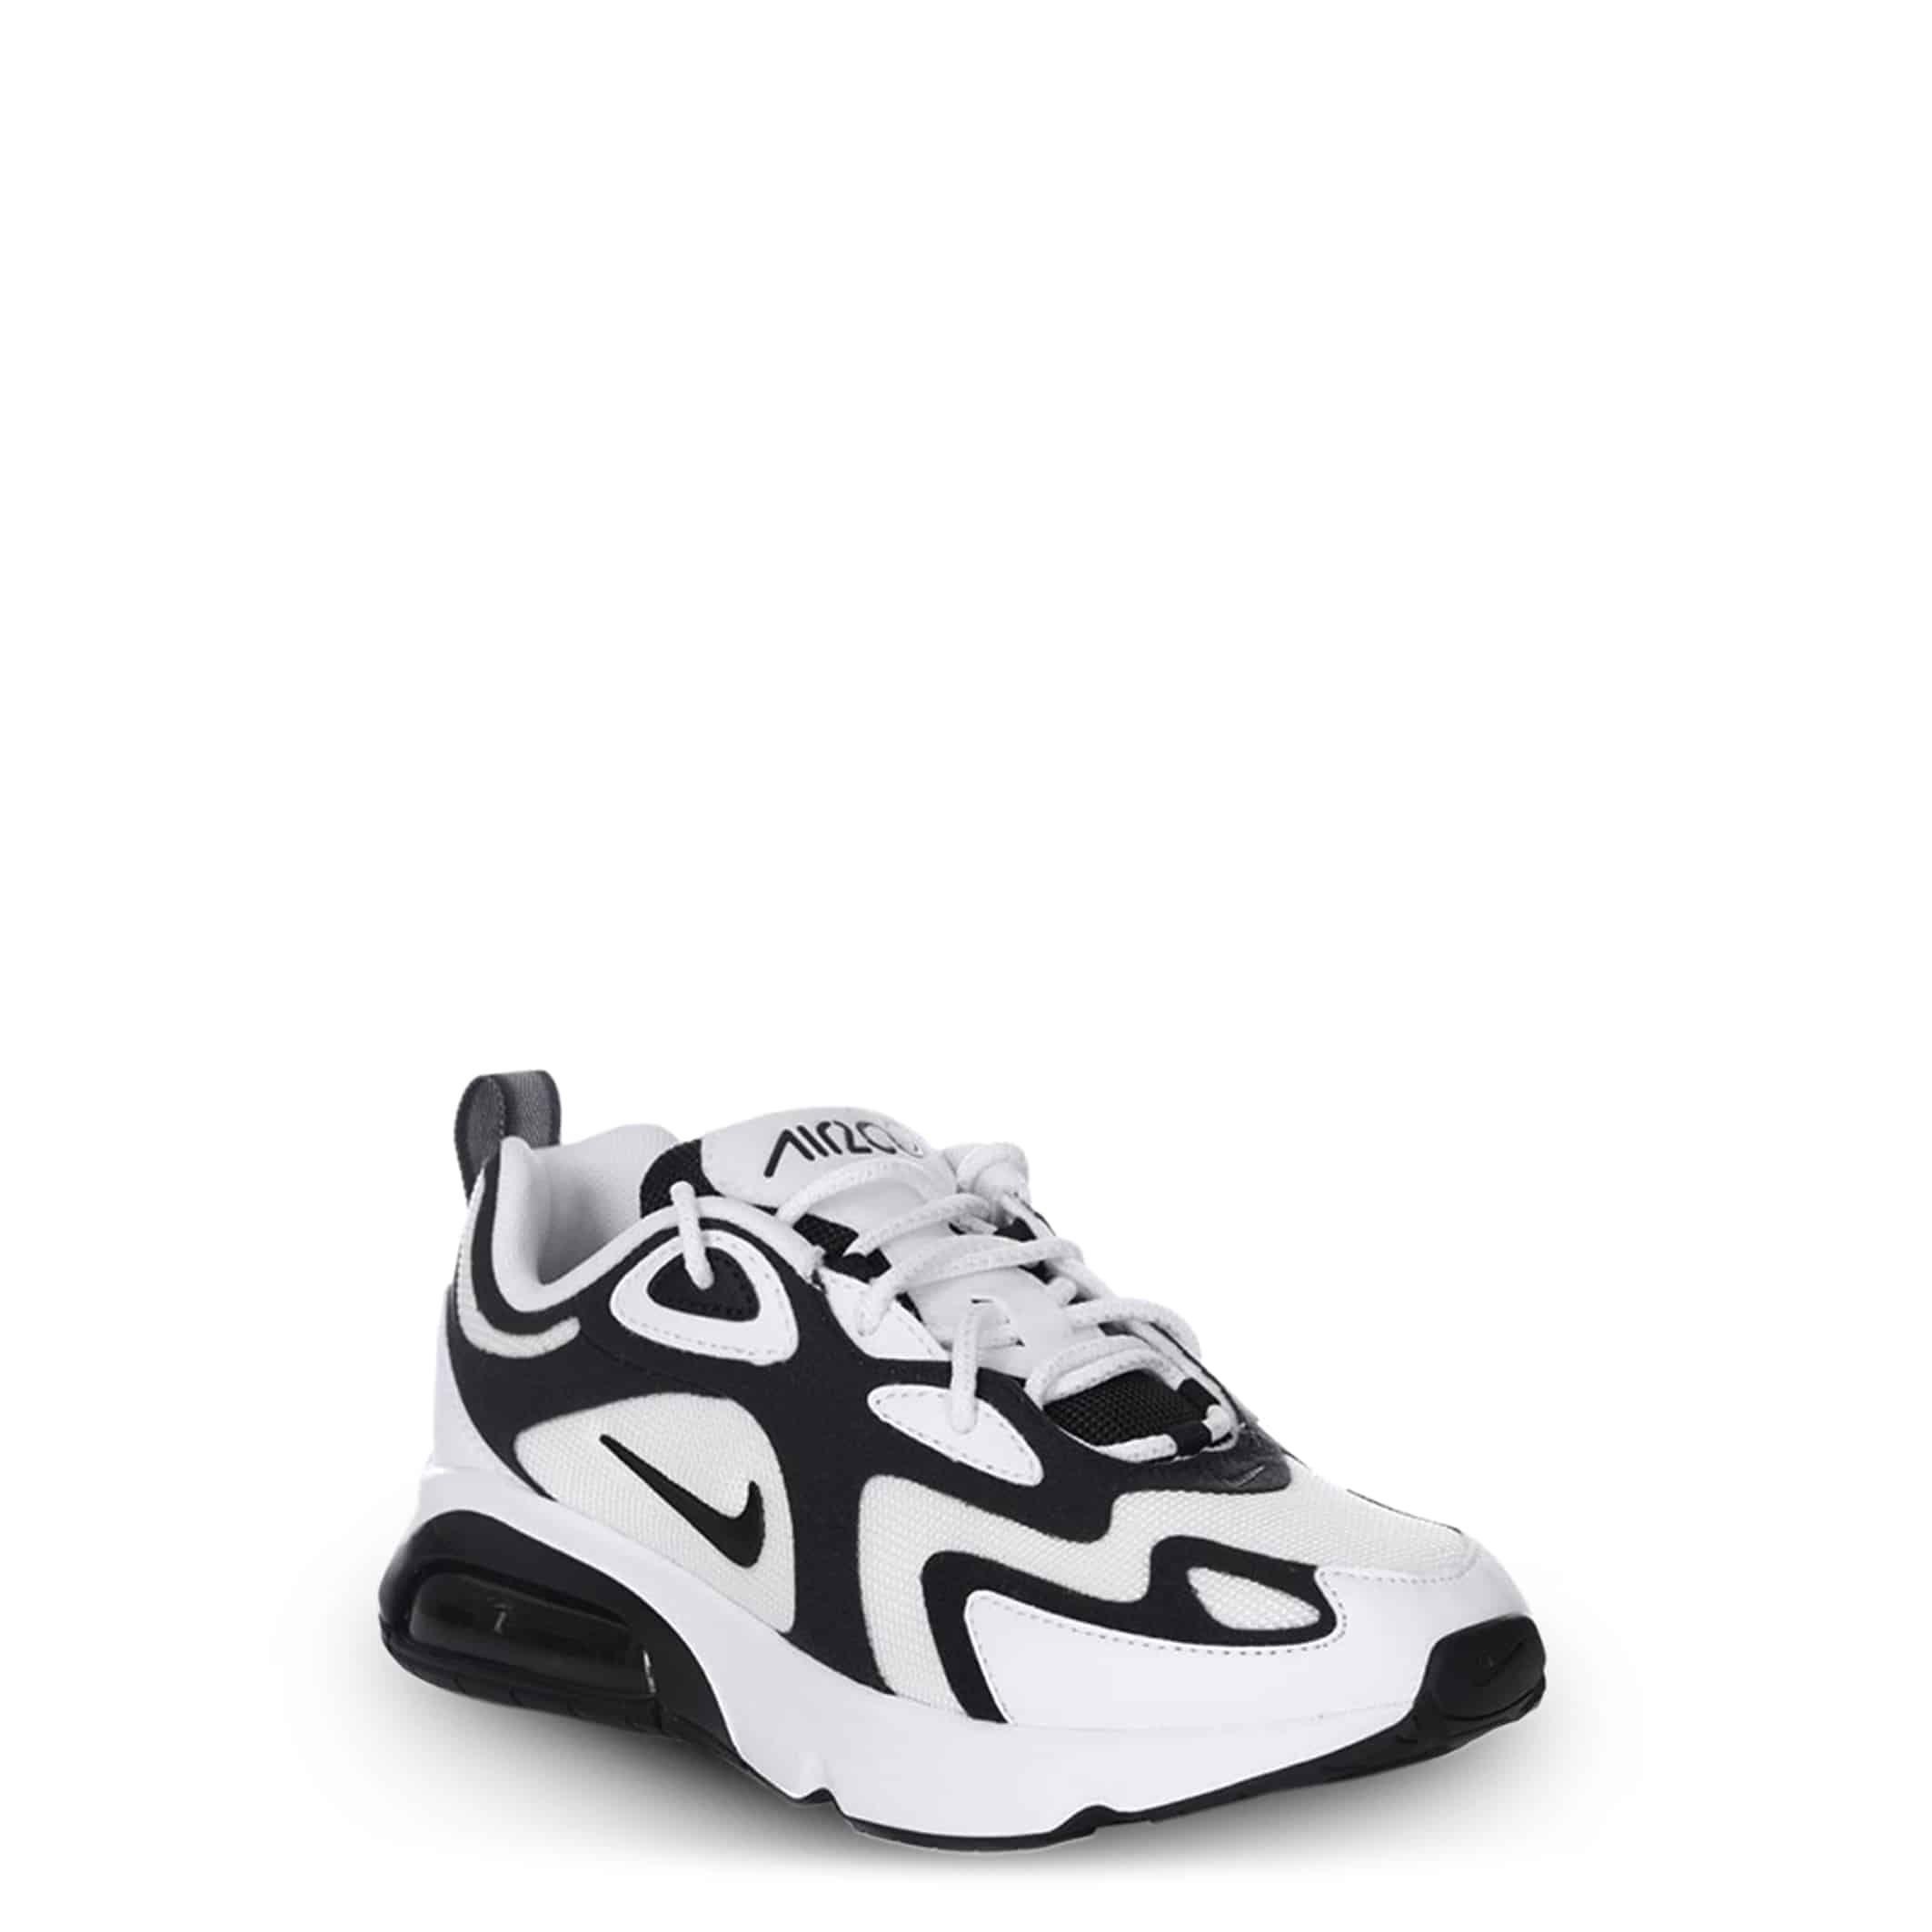 Nike – AirMax200 – Blanco